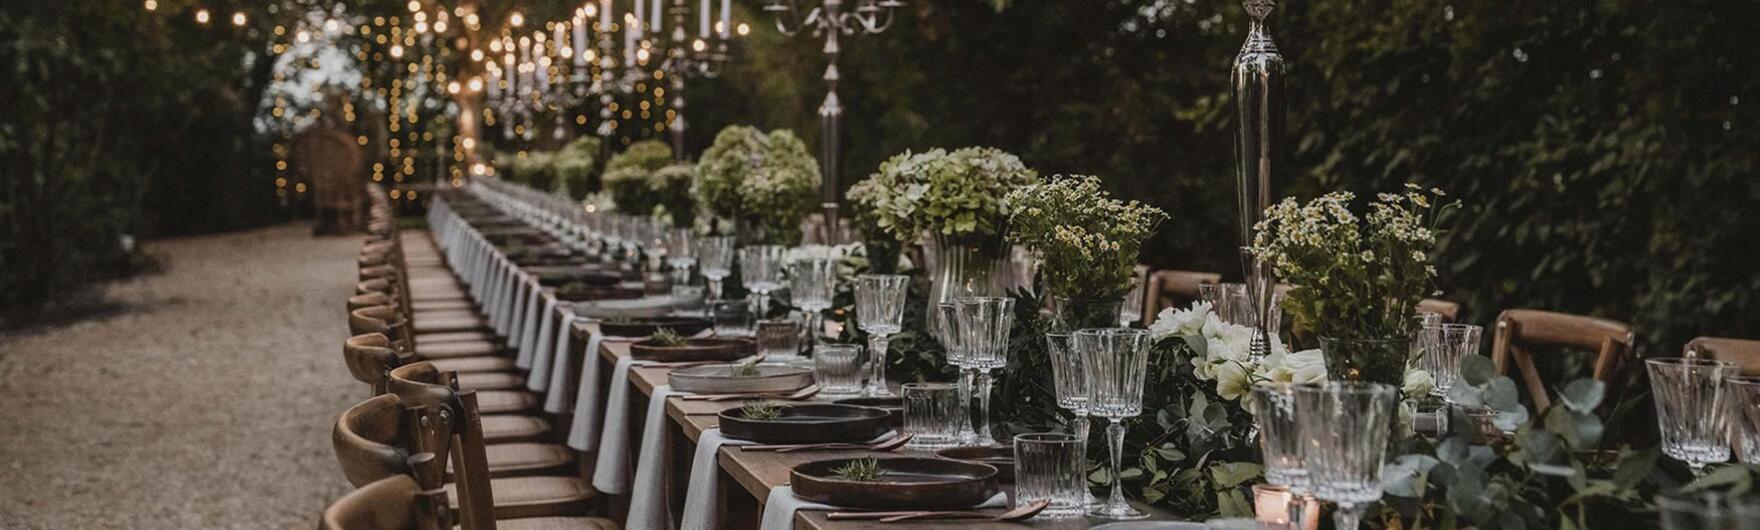 cadelfacco fr the-forest-lieu-pour-mariages 012